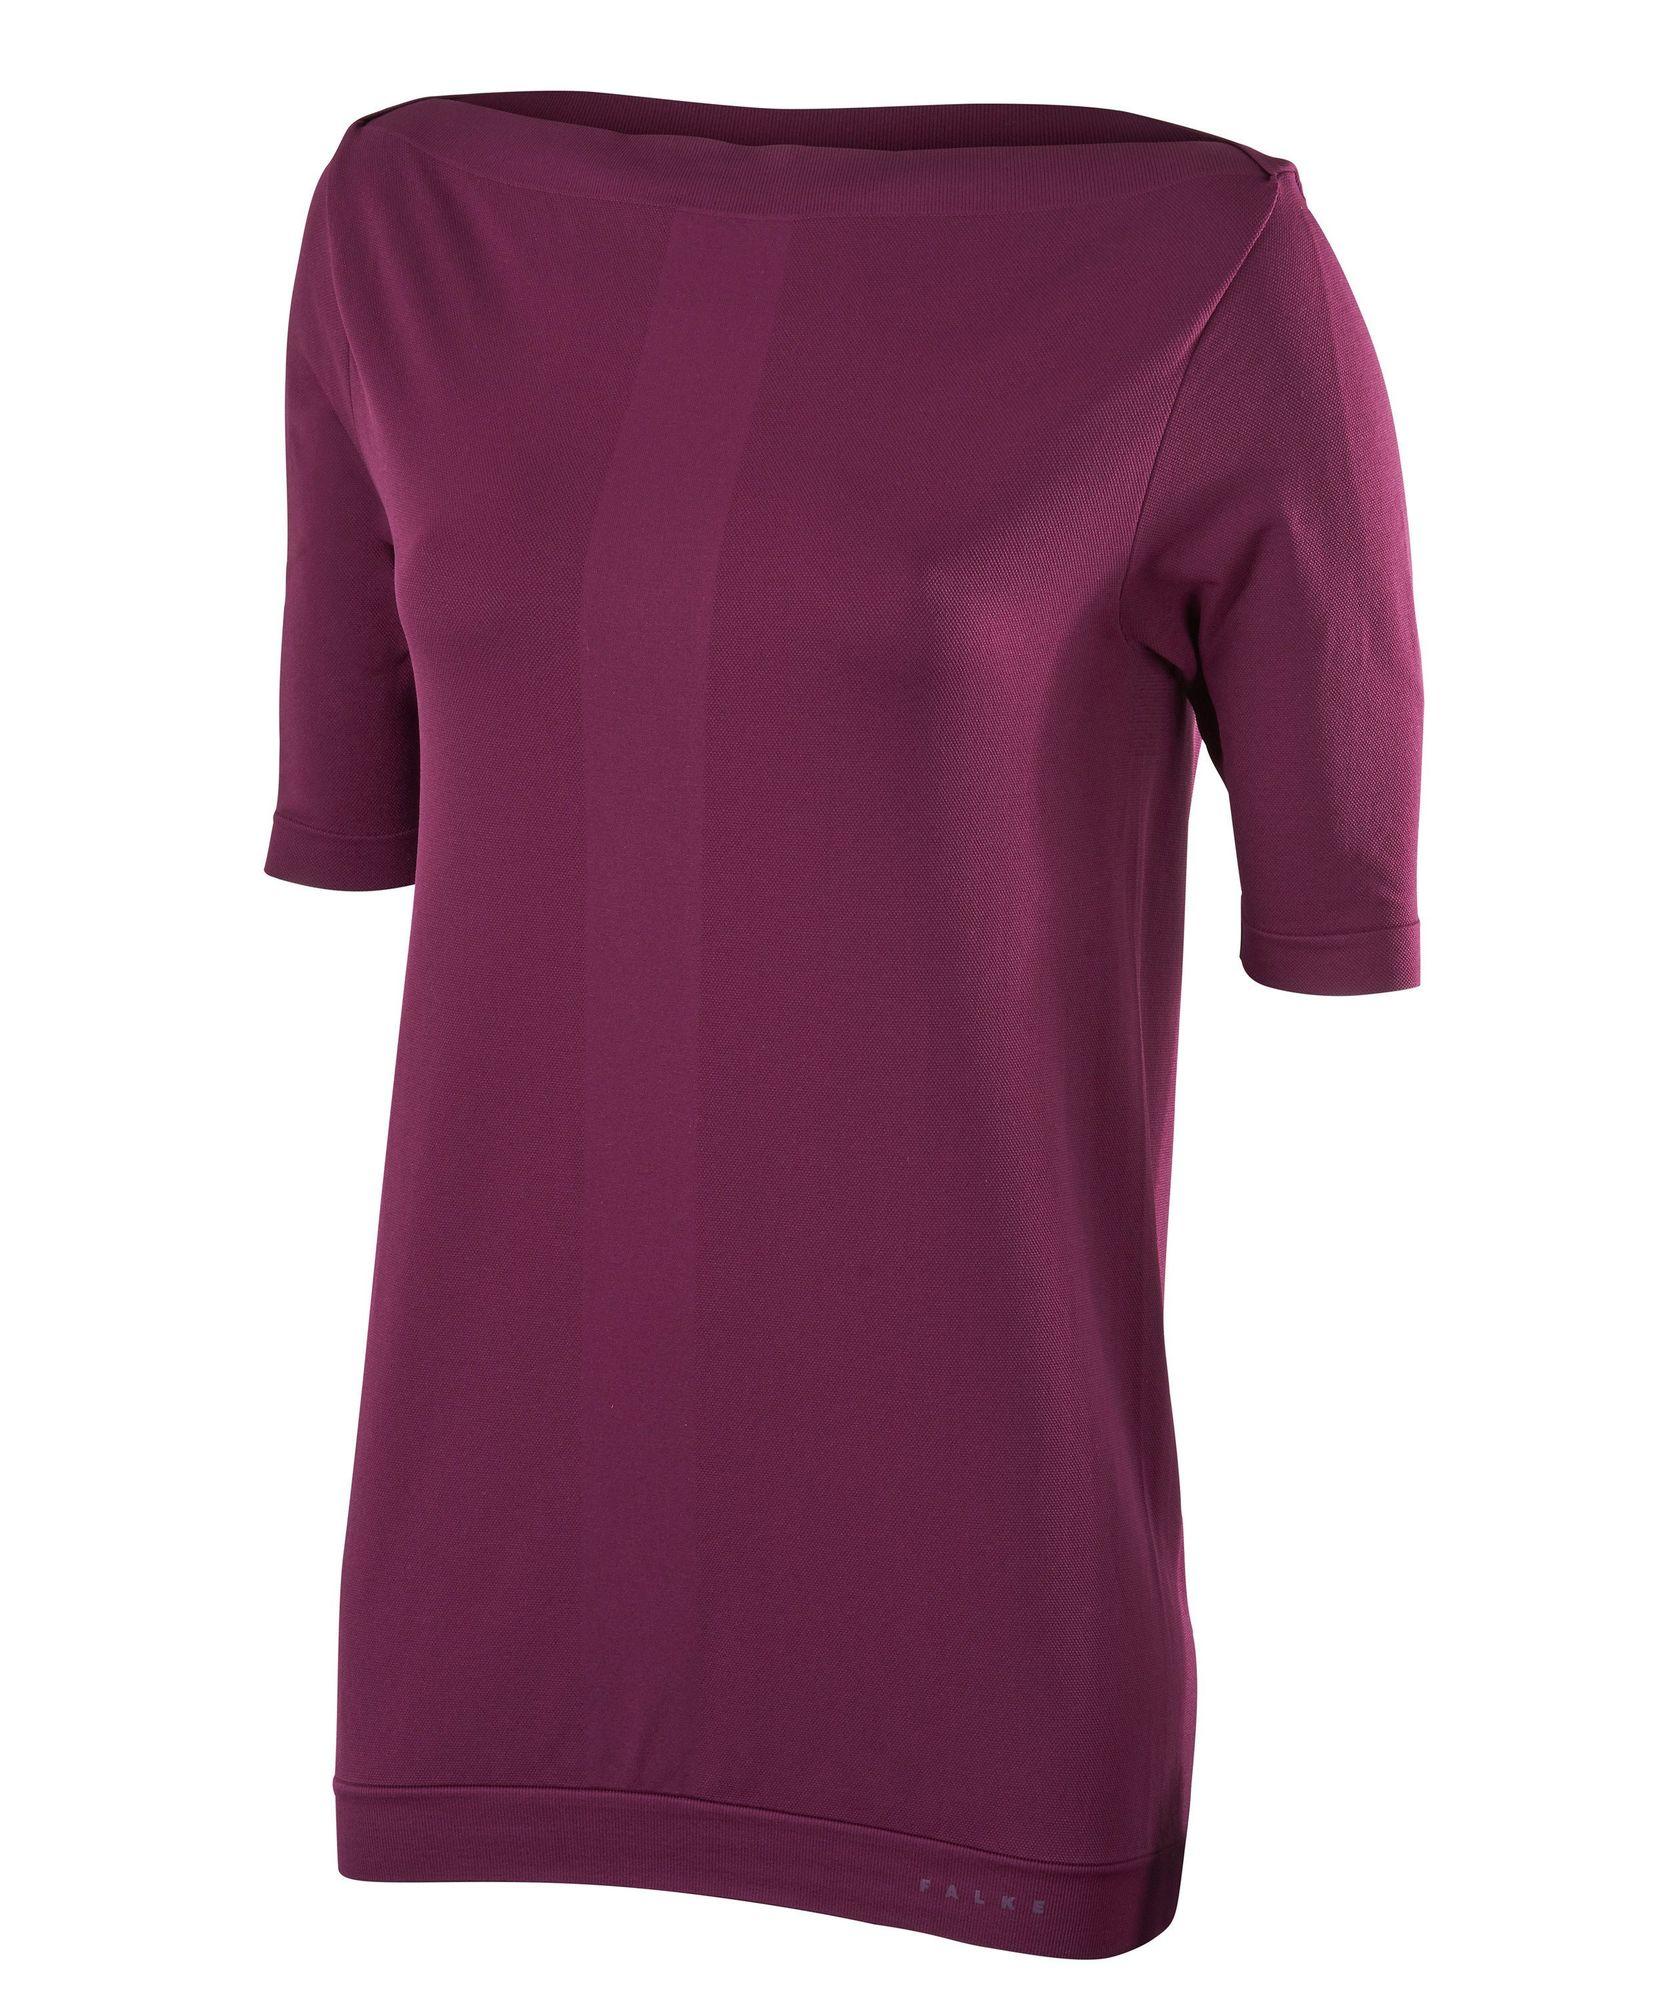 Falke Damen Levanto Shirt in Lila